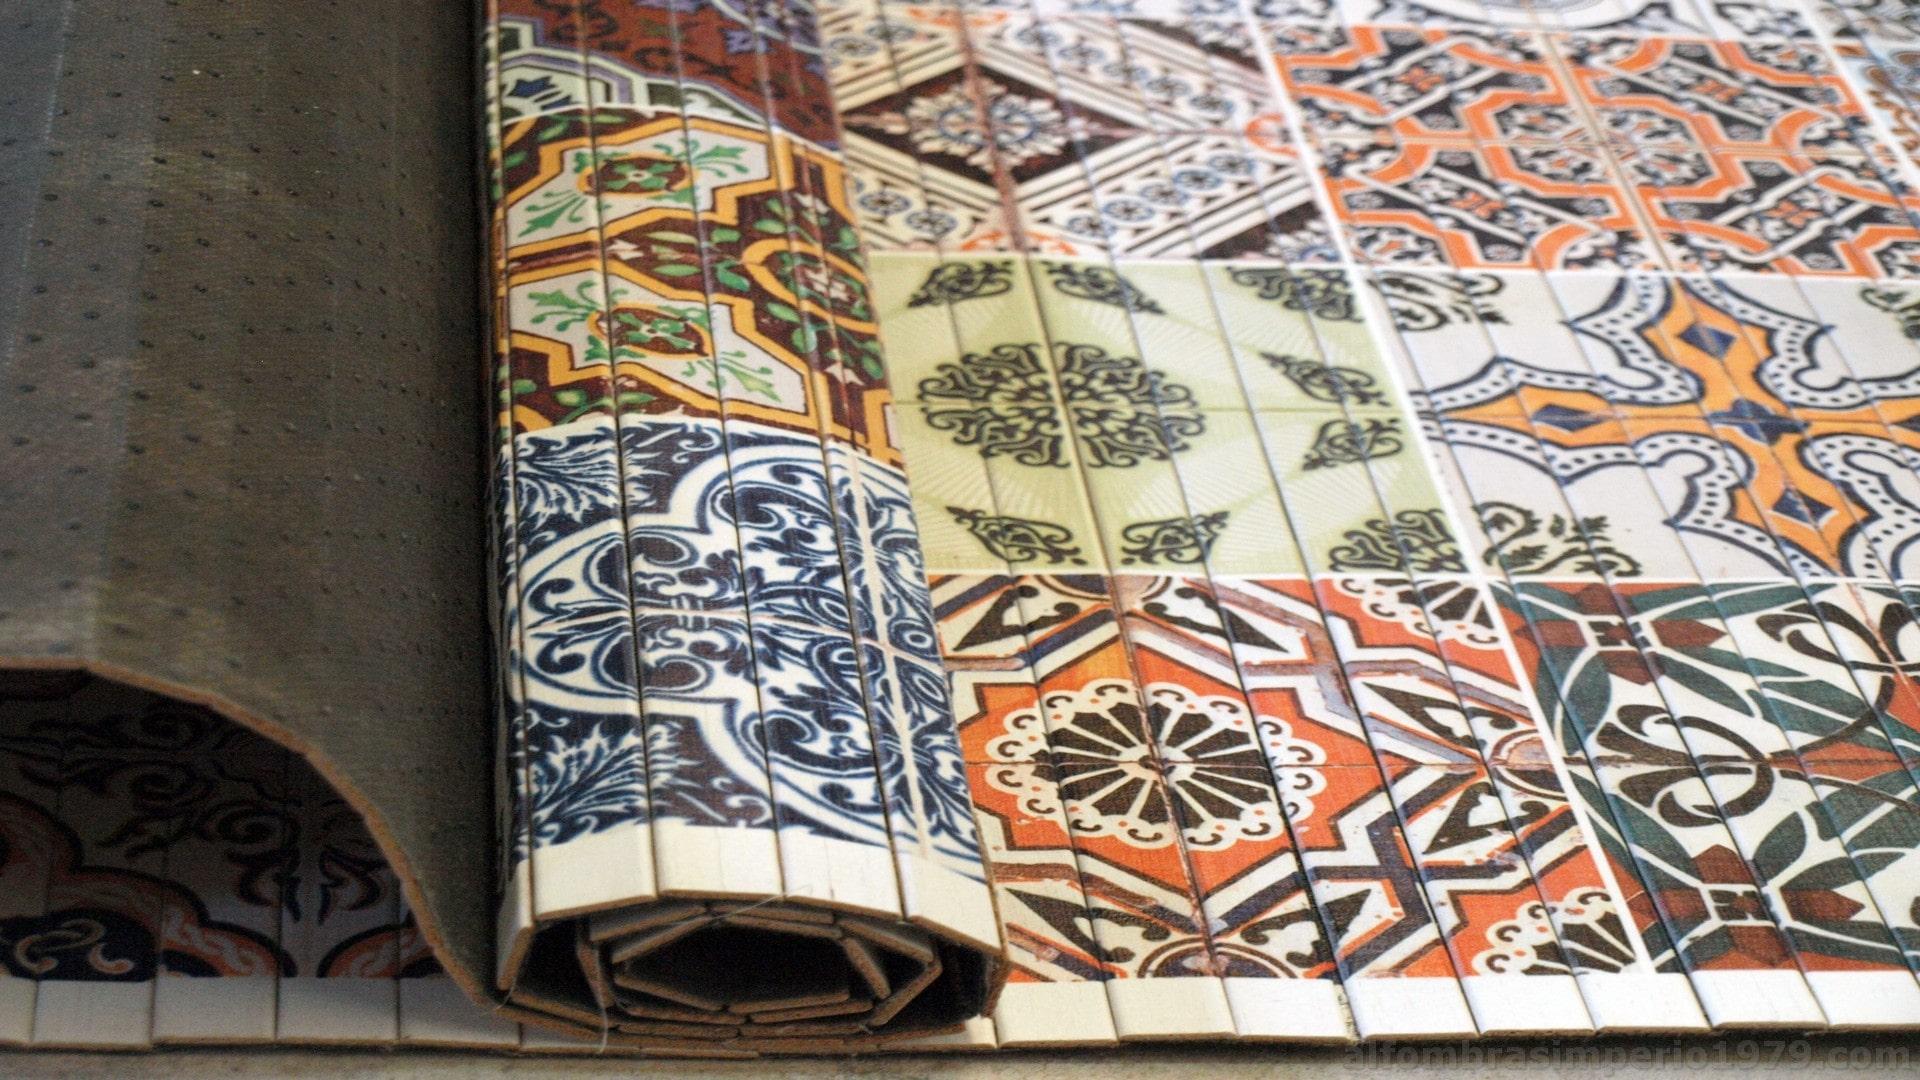 Alfombra a medida bambu impreso hidra1 alfombras a medida - Alfombras de bambu a medida ...